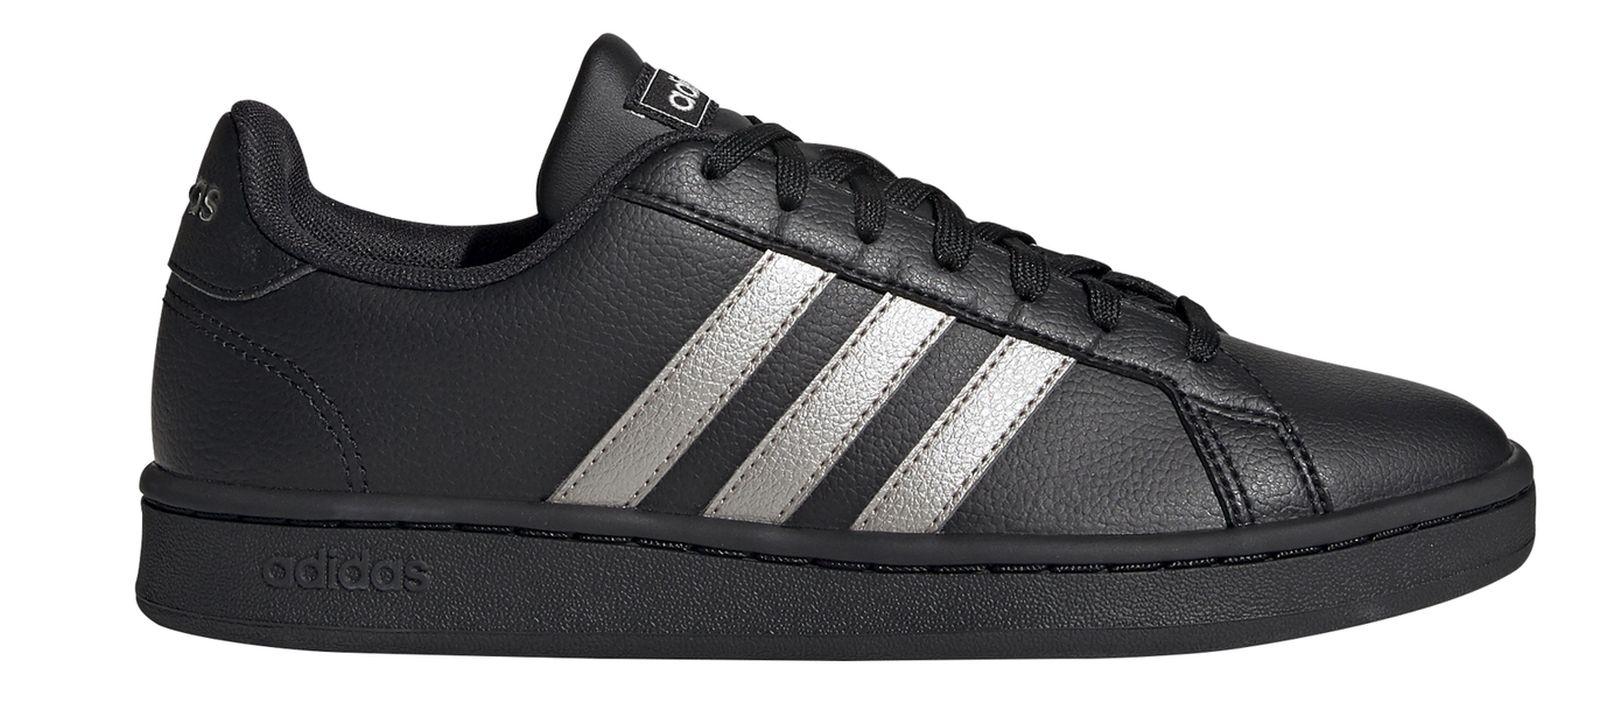 2 Fitness Damen schwarz 0 Sneaker Grand COURT adidas Core Details zu Freizeit Schuh 76vbfYgy